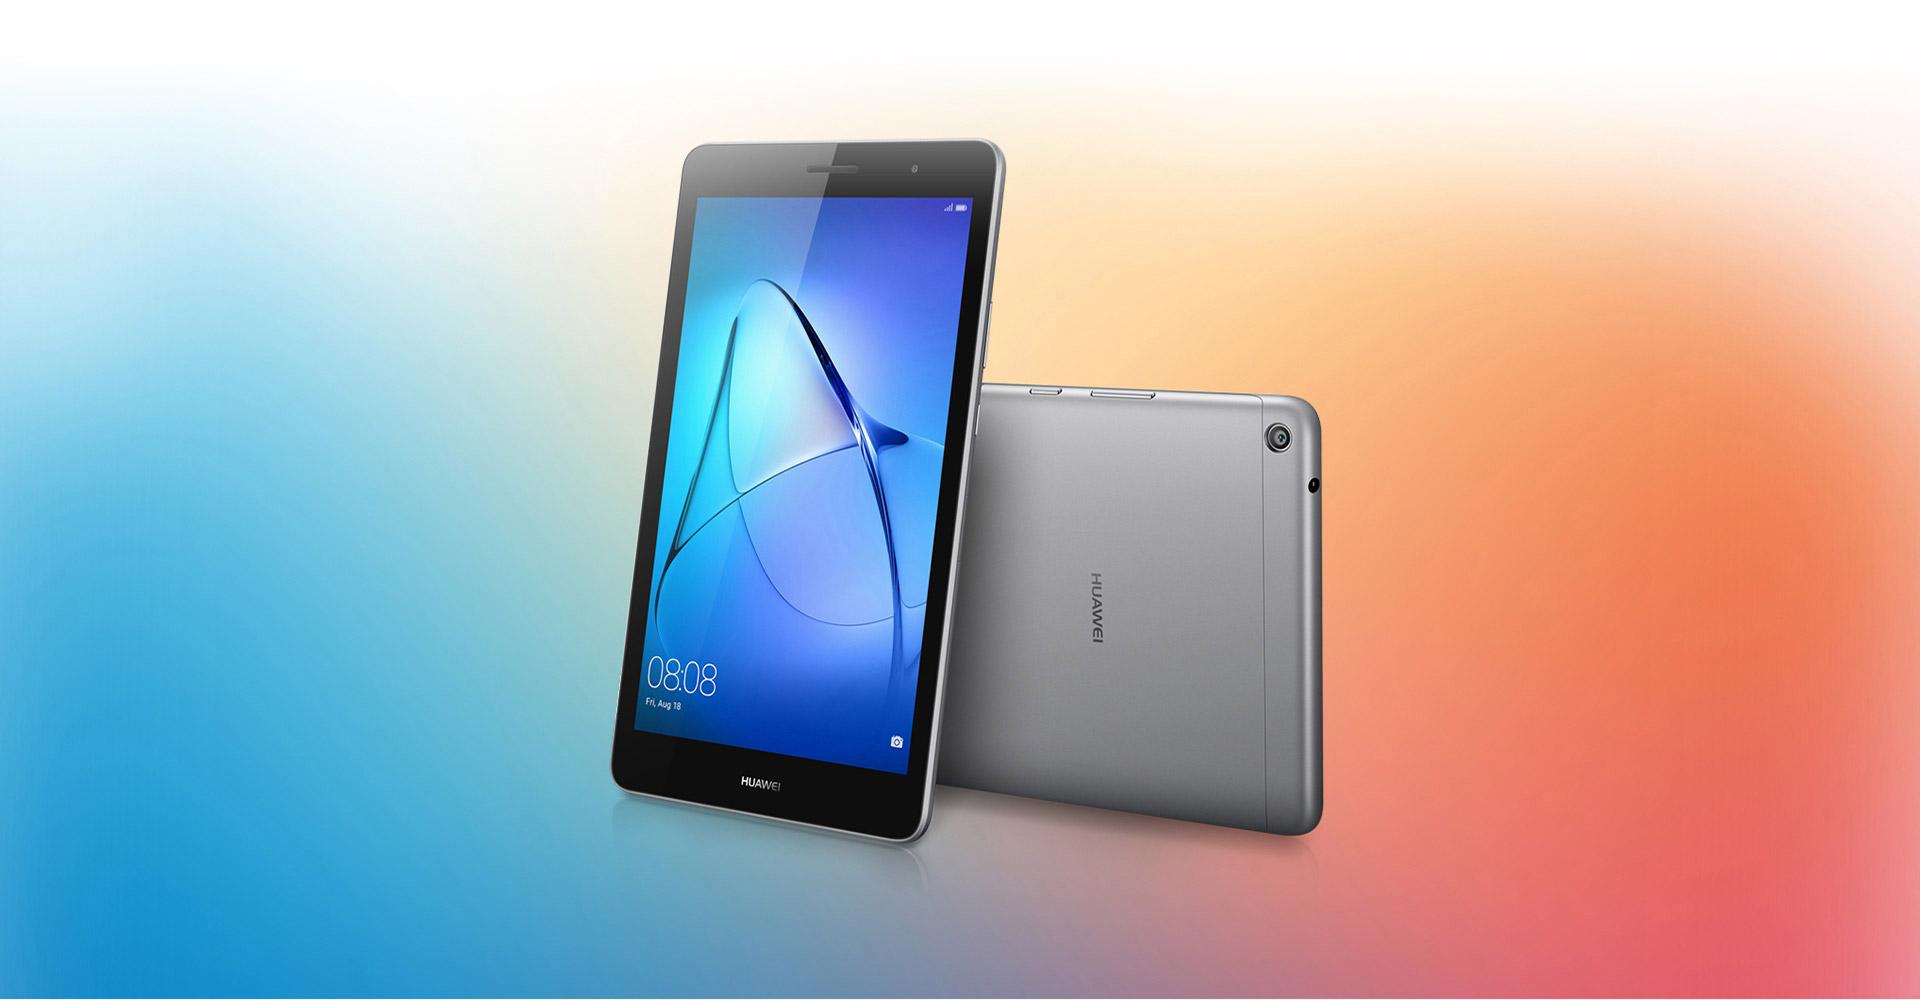 Huawei ジャパン、エントリー向けタブレット「MediaPad T3(KOB-L09/W09)」を8月25日発売